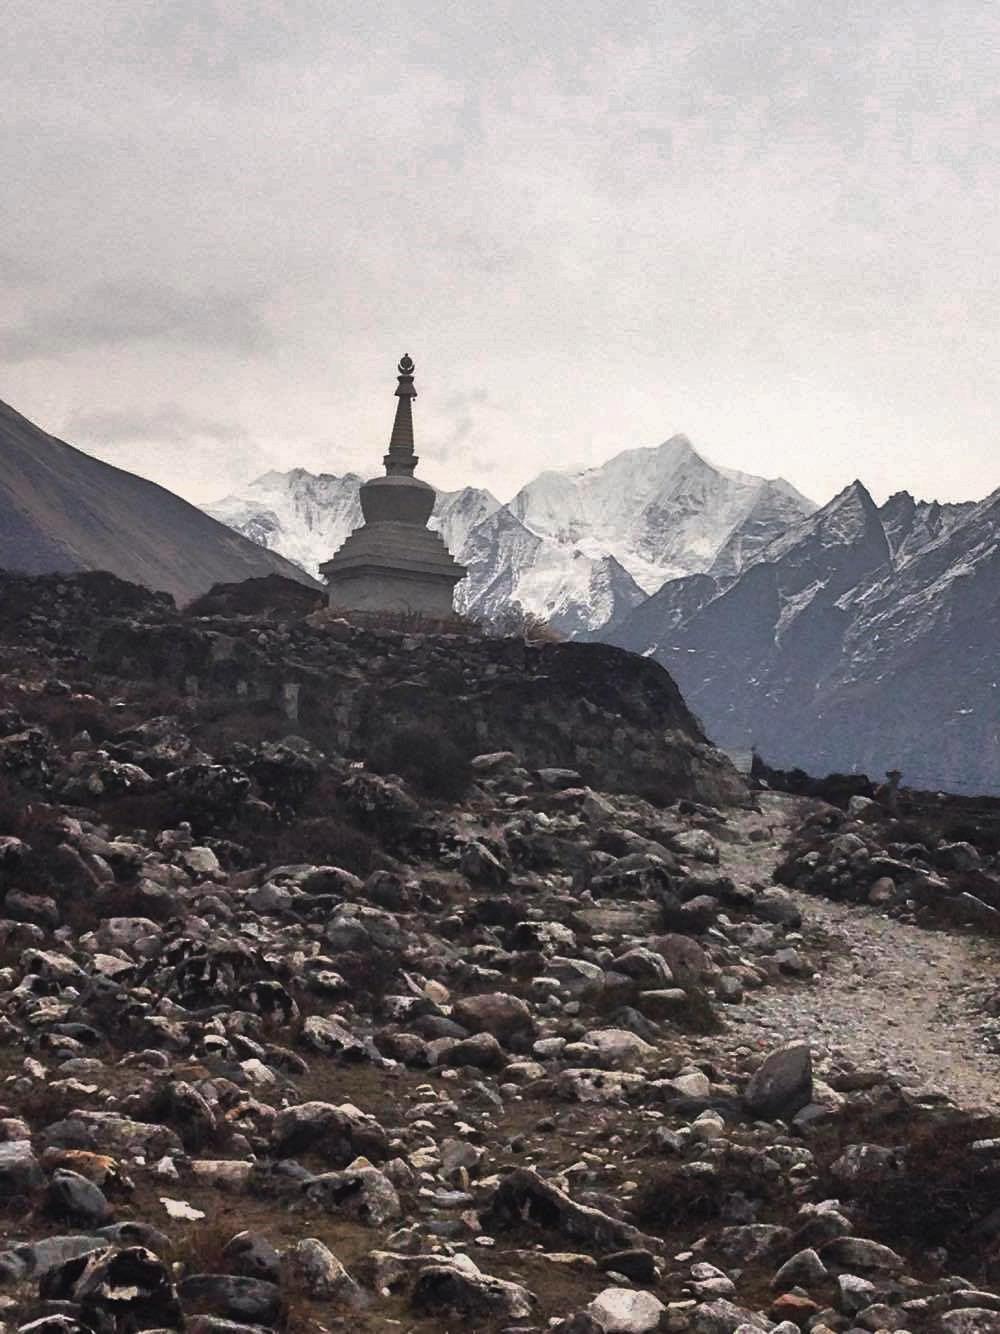 Langtang_Stupa_and_mountains_April_2016_Adventure_Alternative_Nepal.jpg